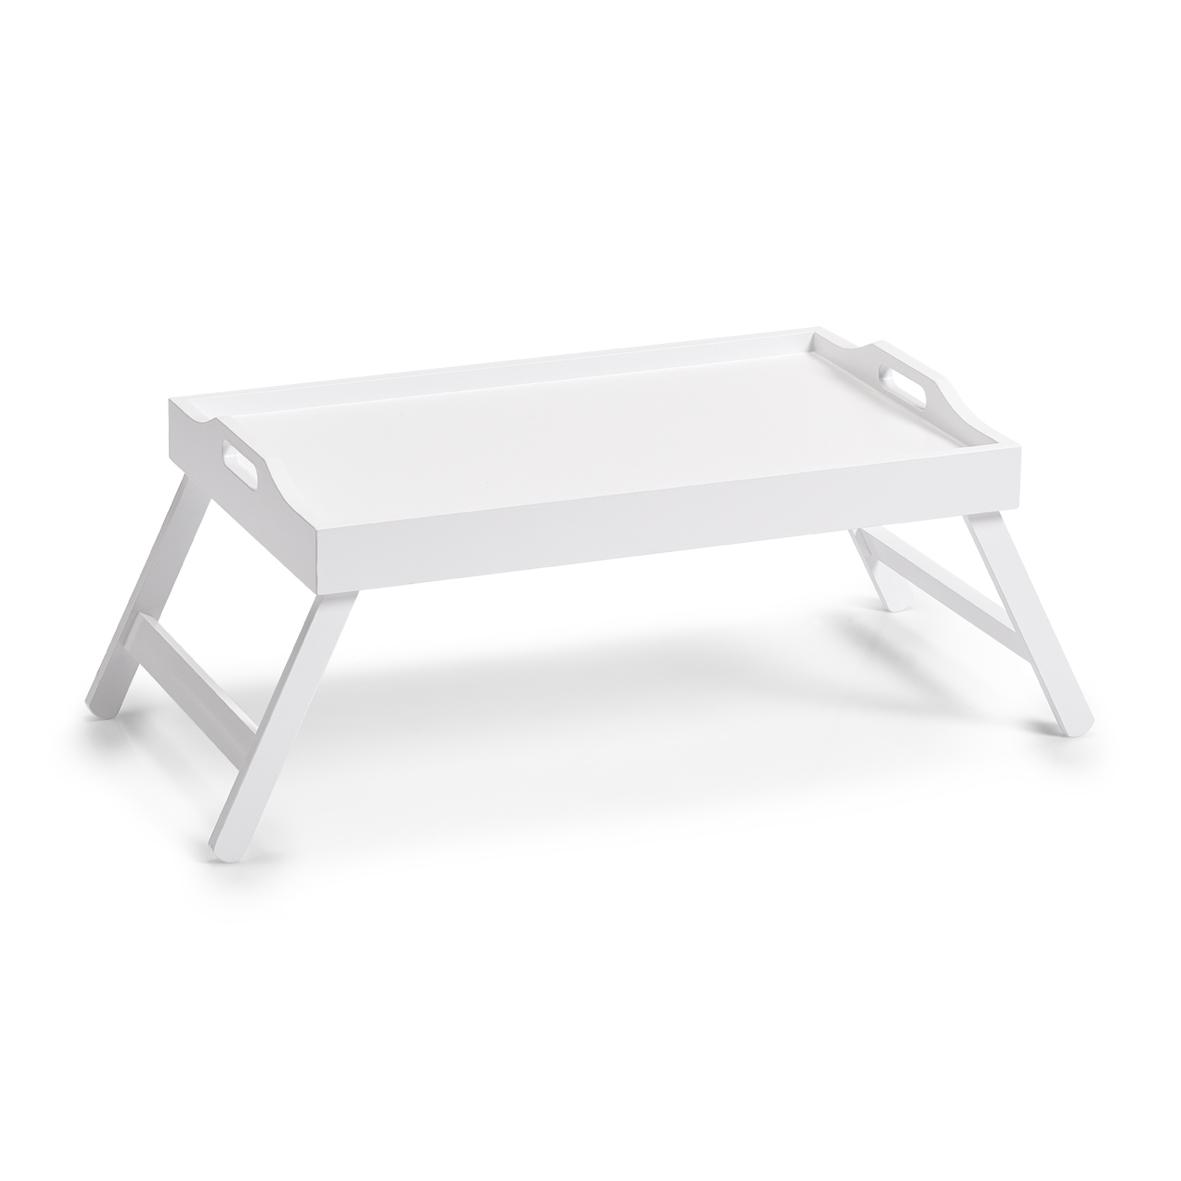 Masuta pliabila servire pat, MDF White, L56,5xl35,5xH27 cm imagine